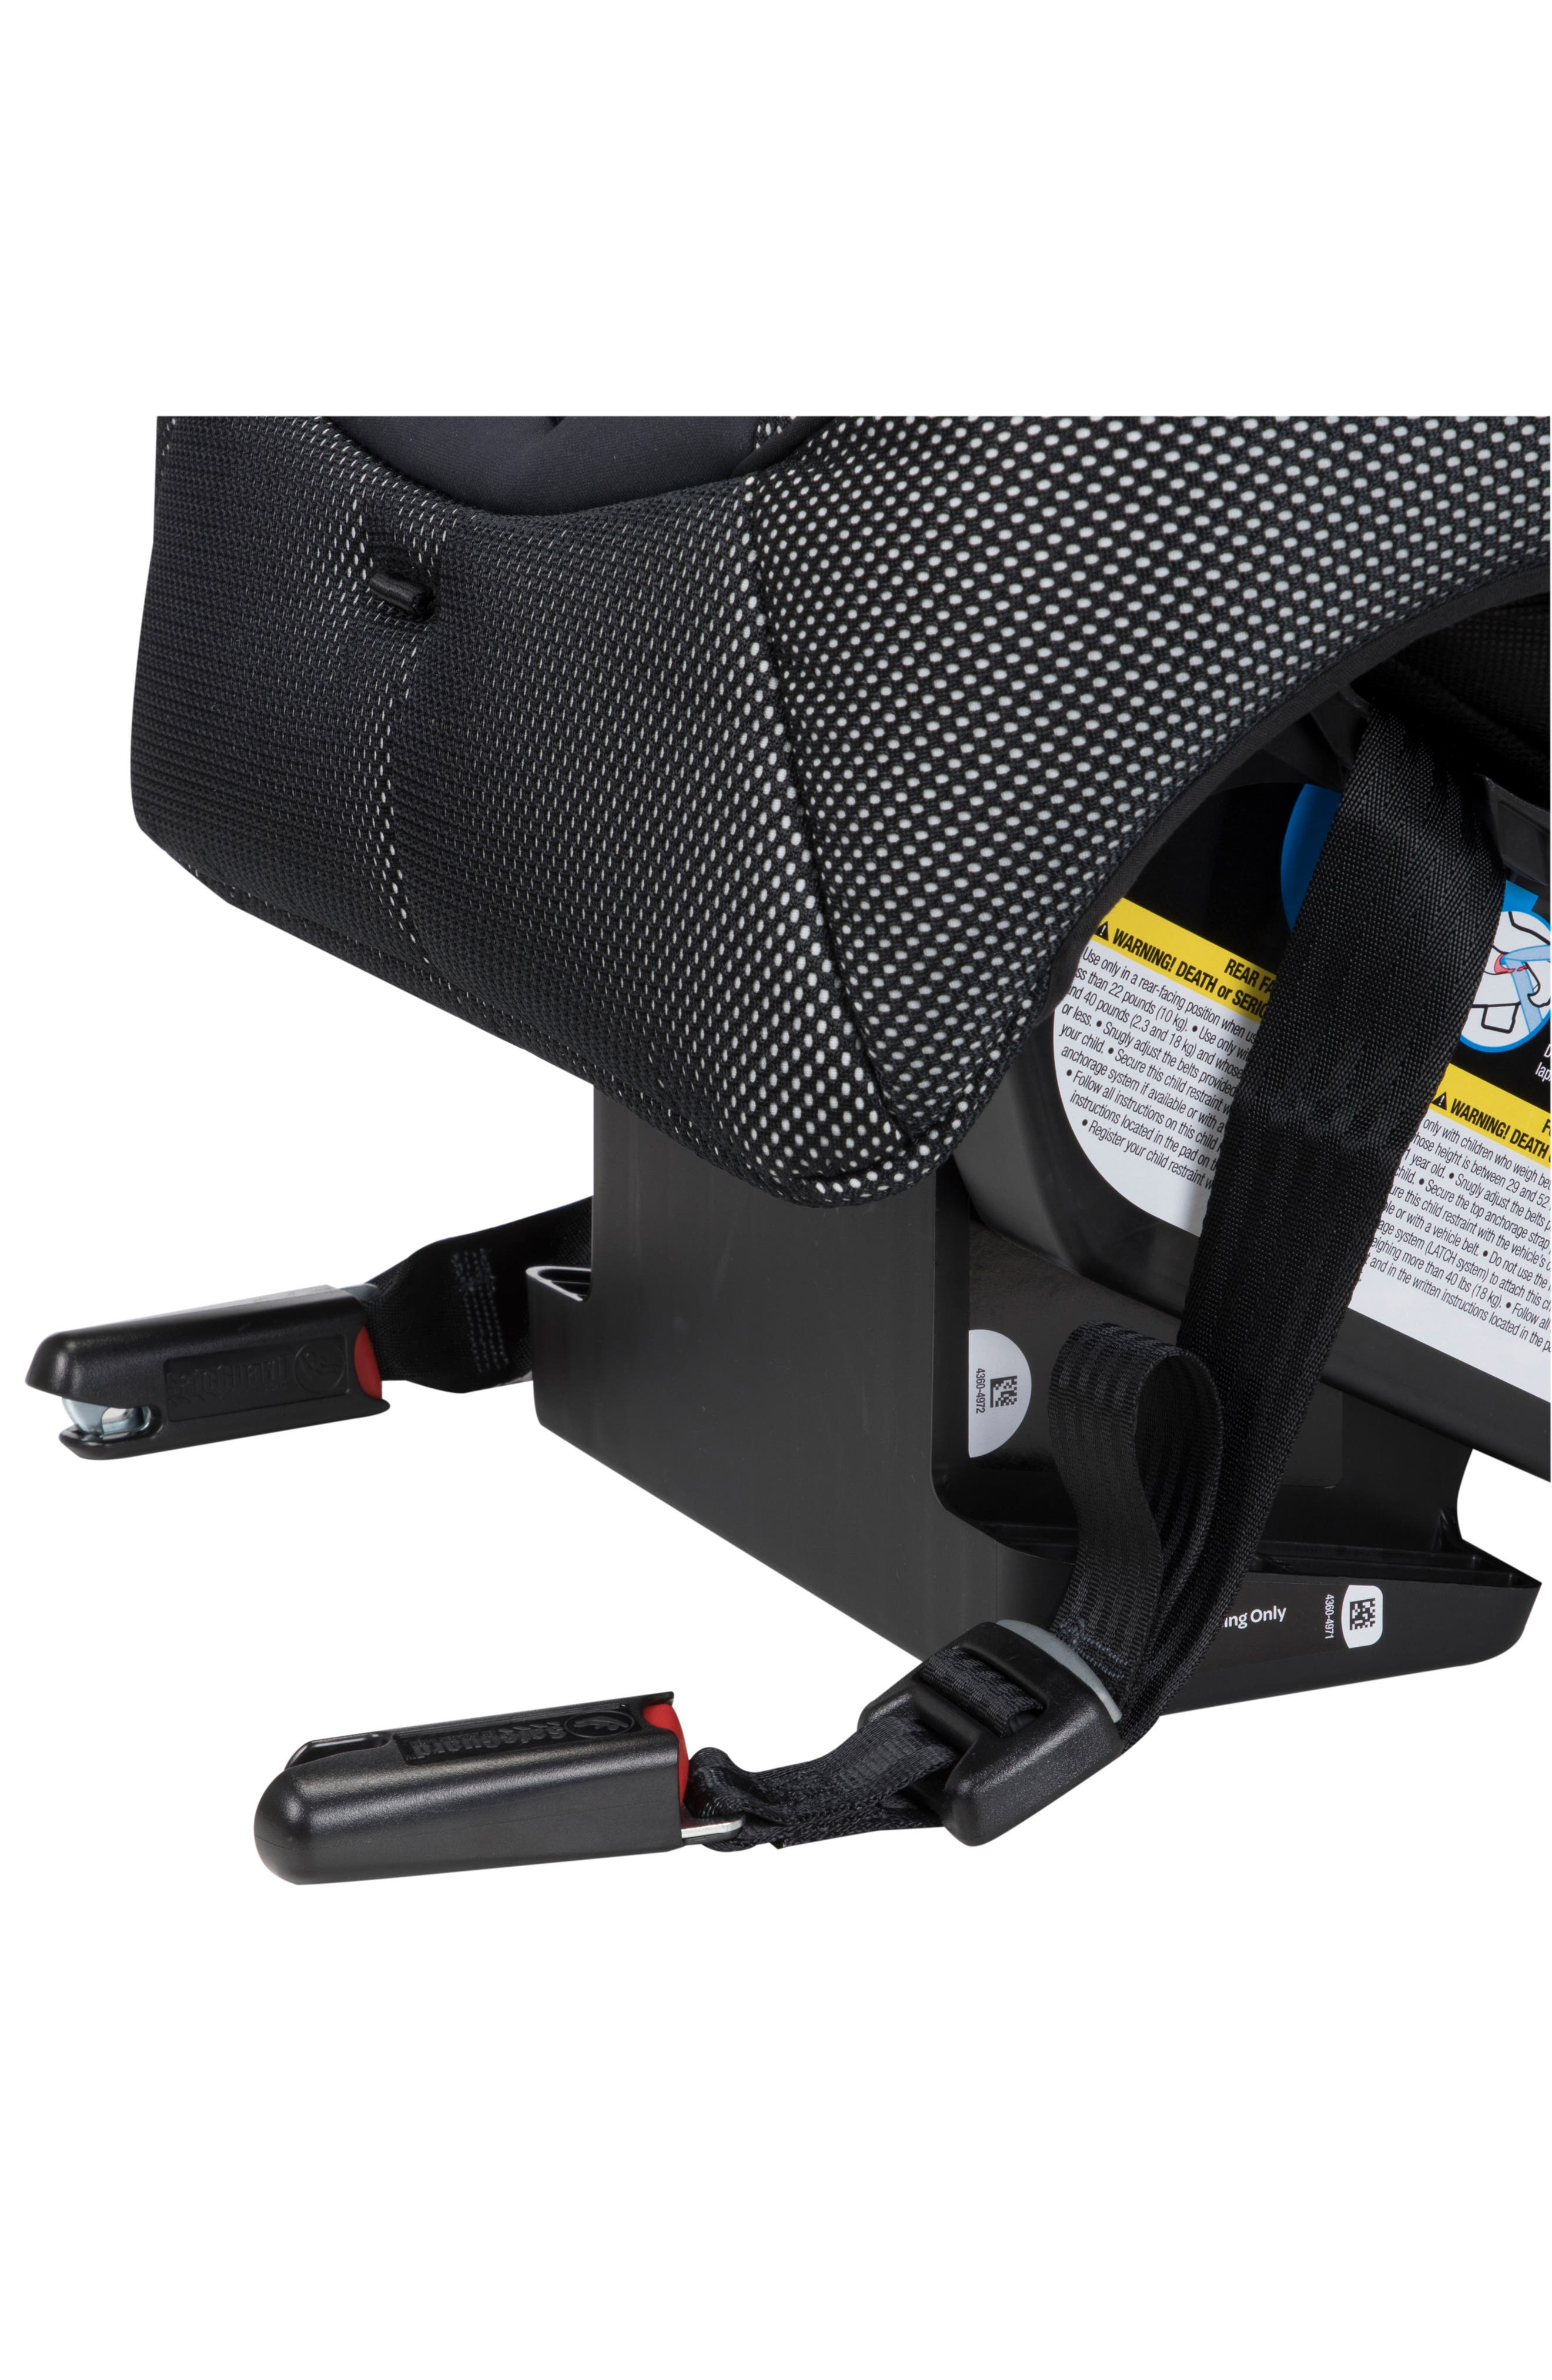 x Rachel Zoe Pria<sup>™</sup> 85 Luxe Sport Max Convertible Car Seat,                             Alternate thumbnail 10, color,                             Rz Luxe Sport